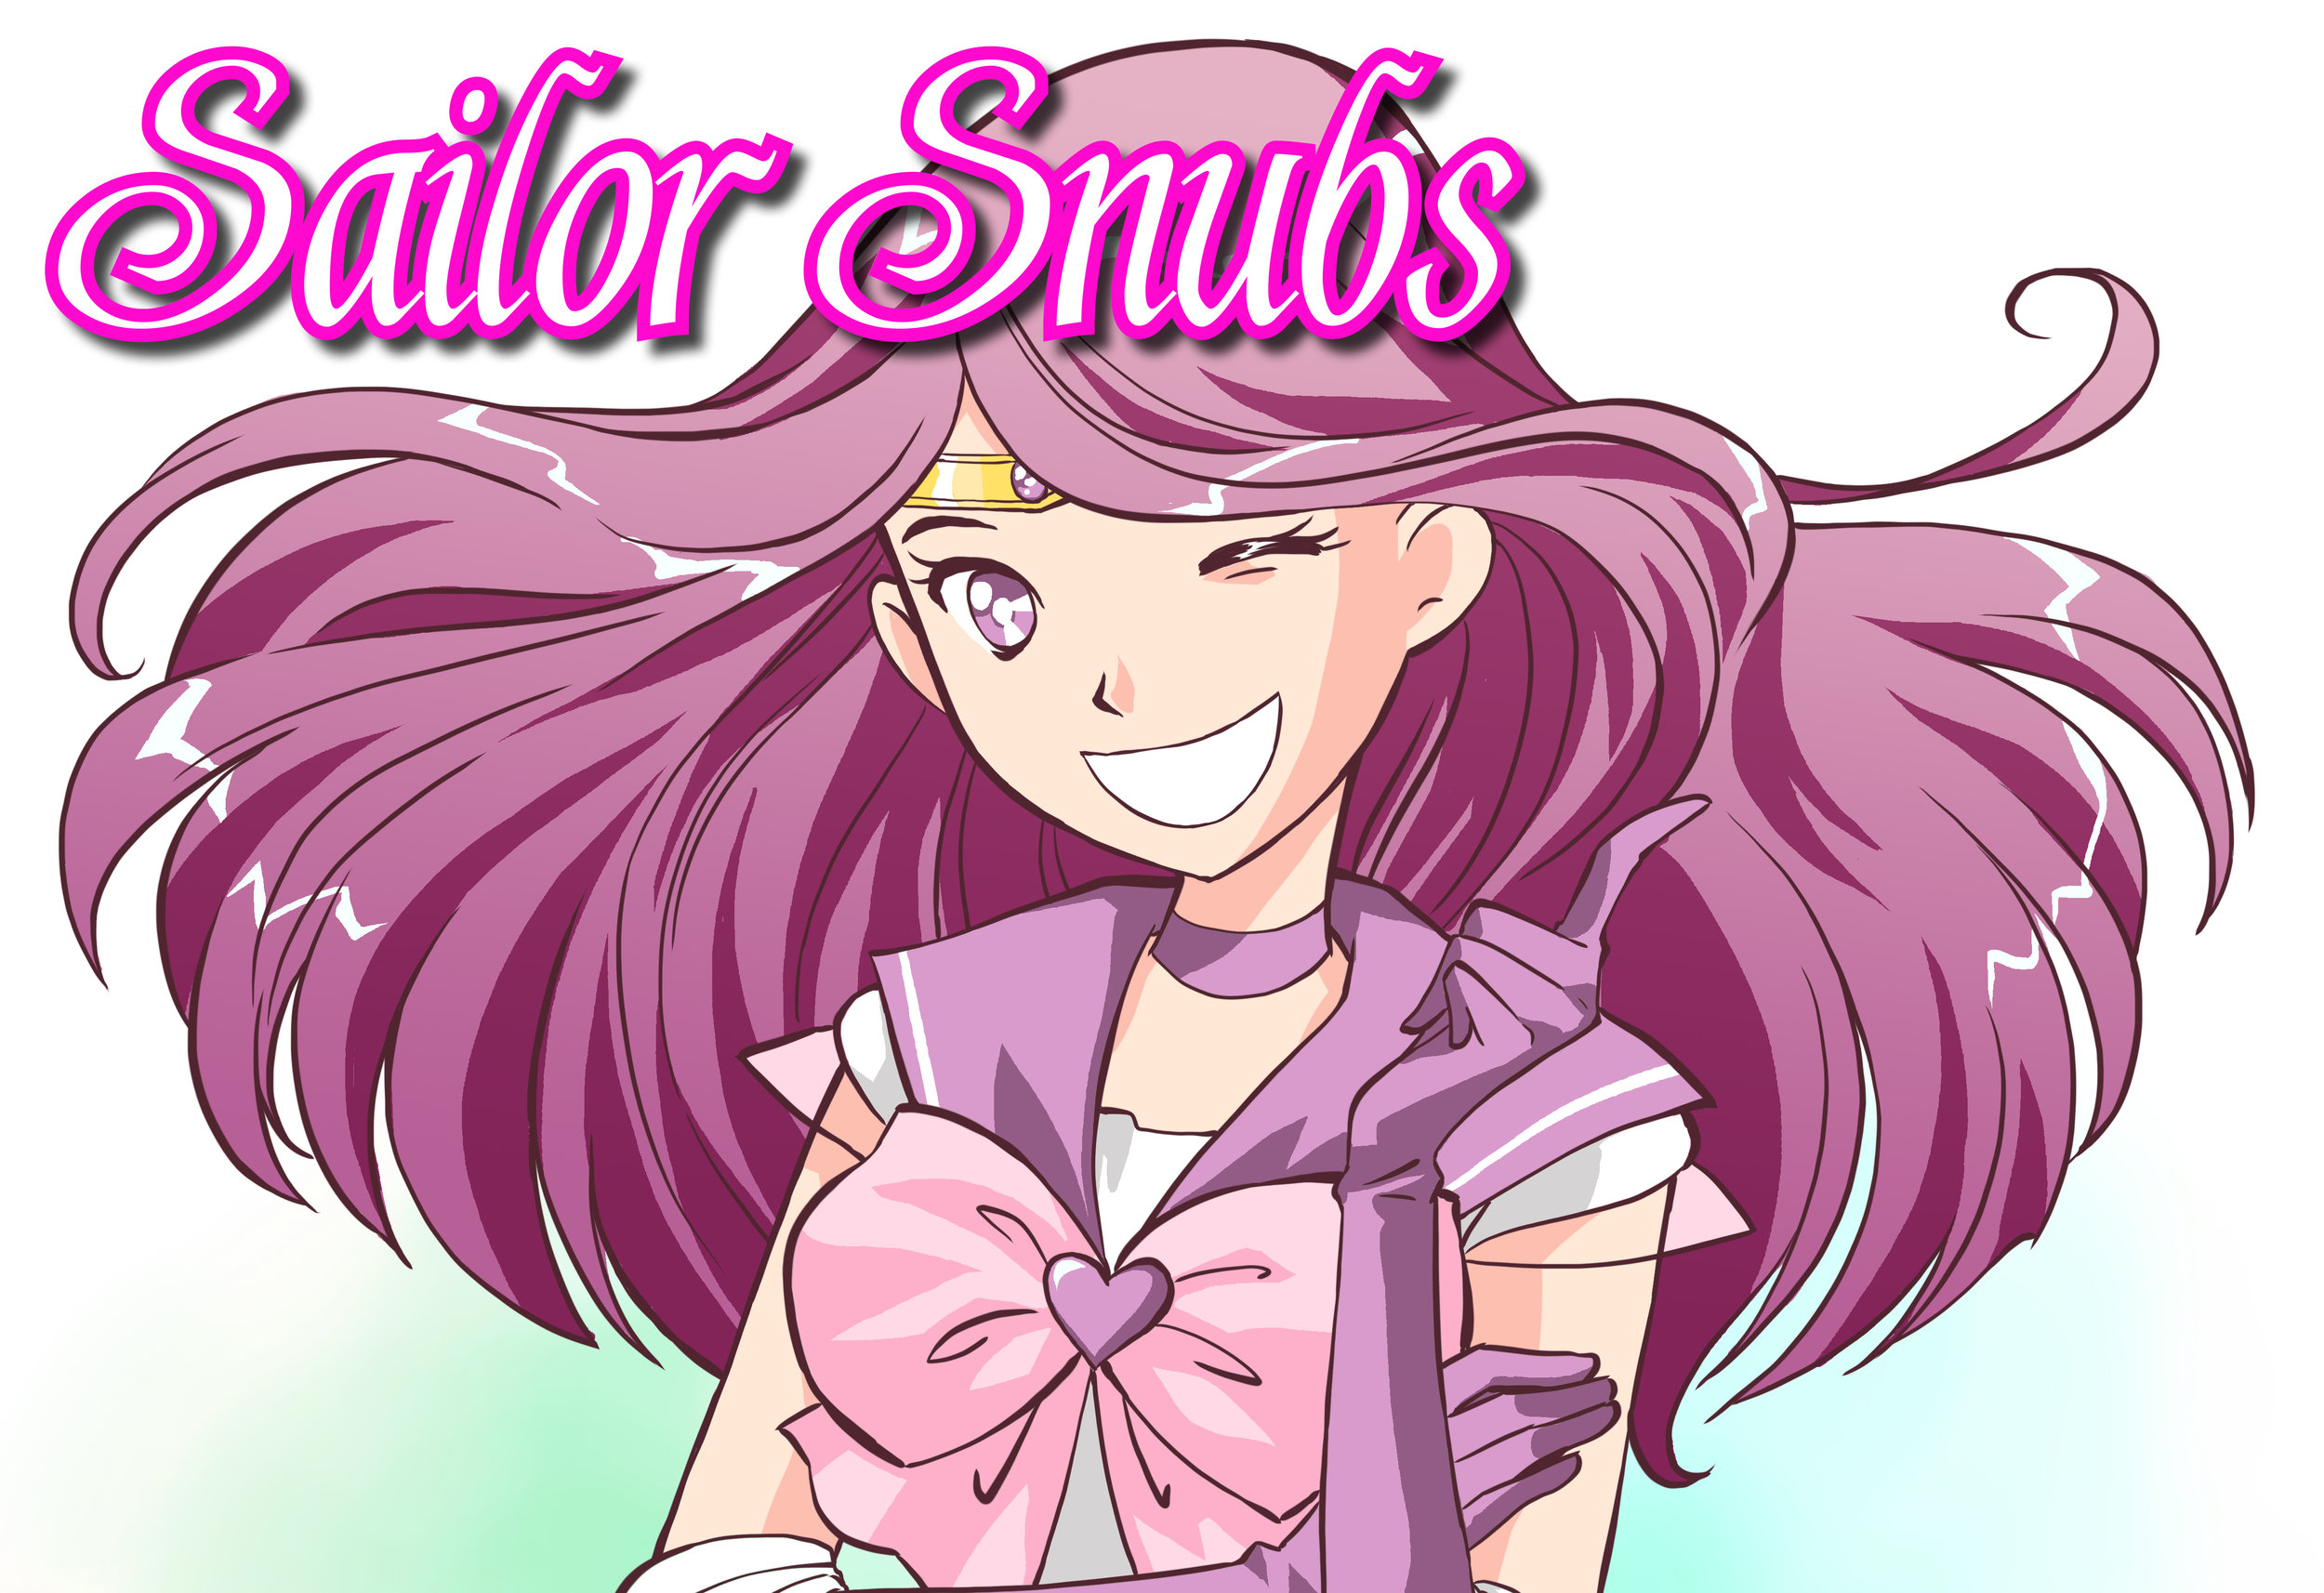 SailorShannnonwebsitephoto.jpg